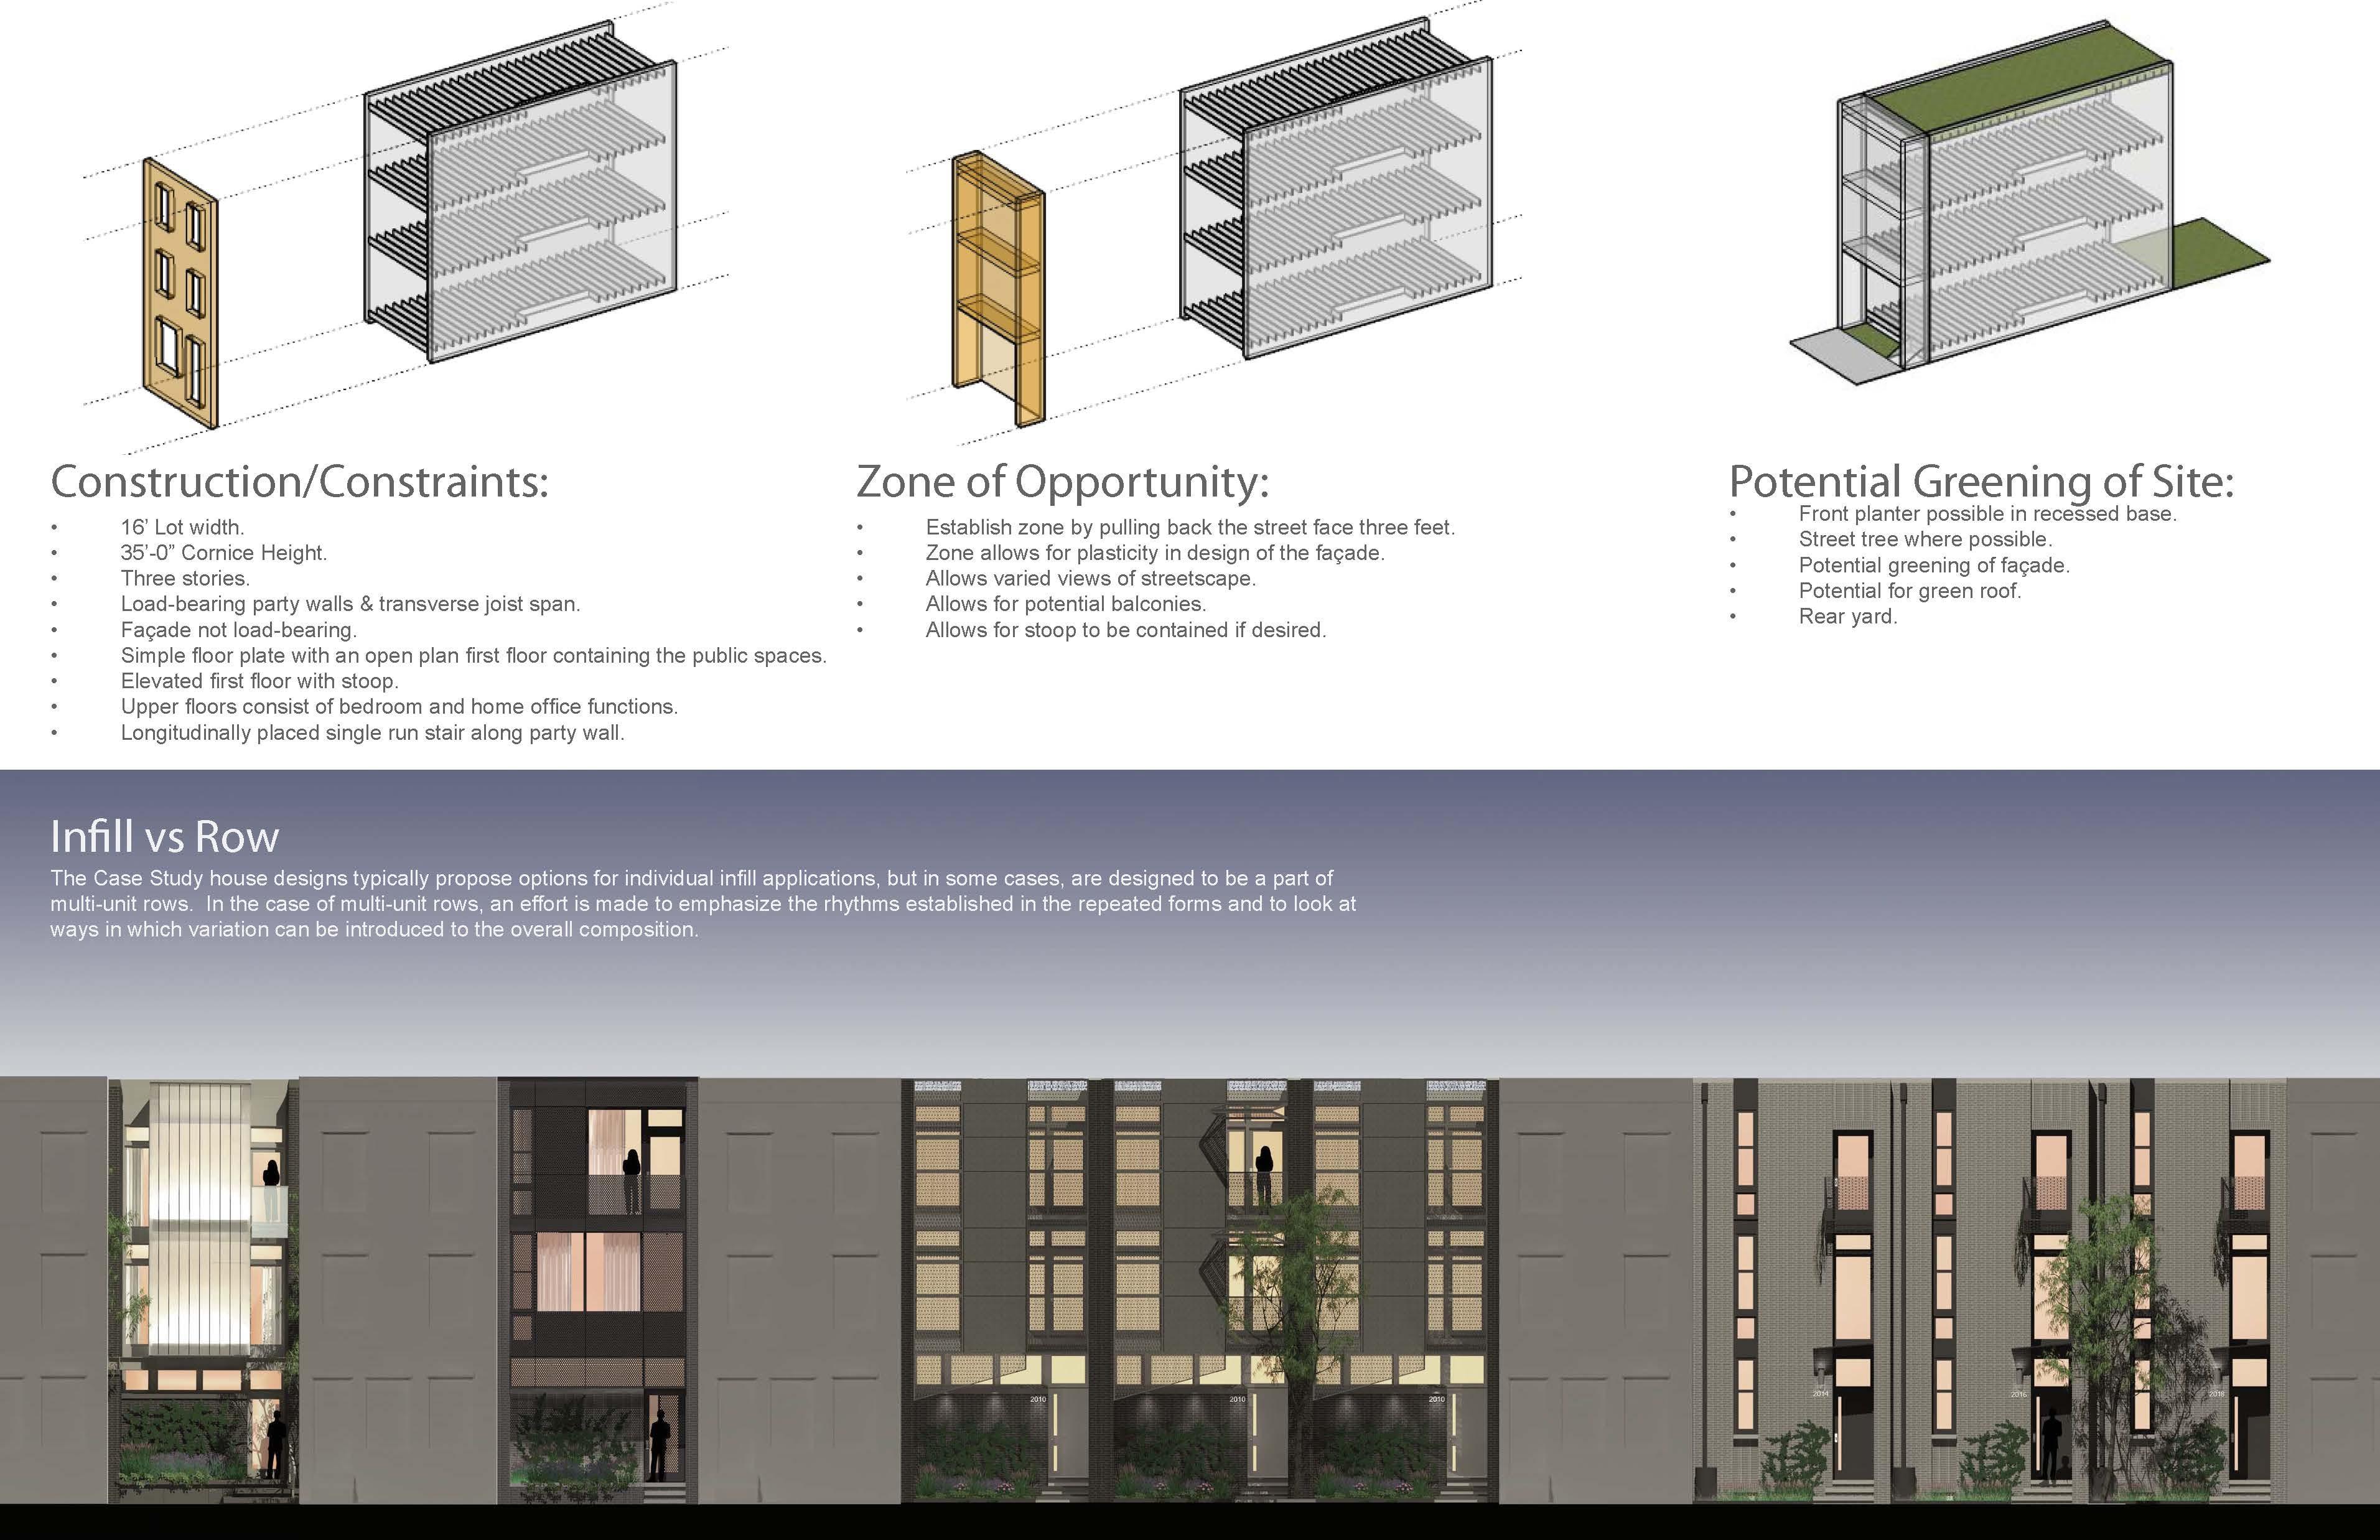 CASE STUDY INTRO 2 – RKM Architects